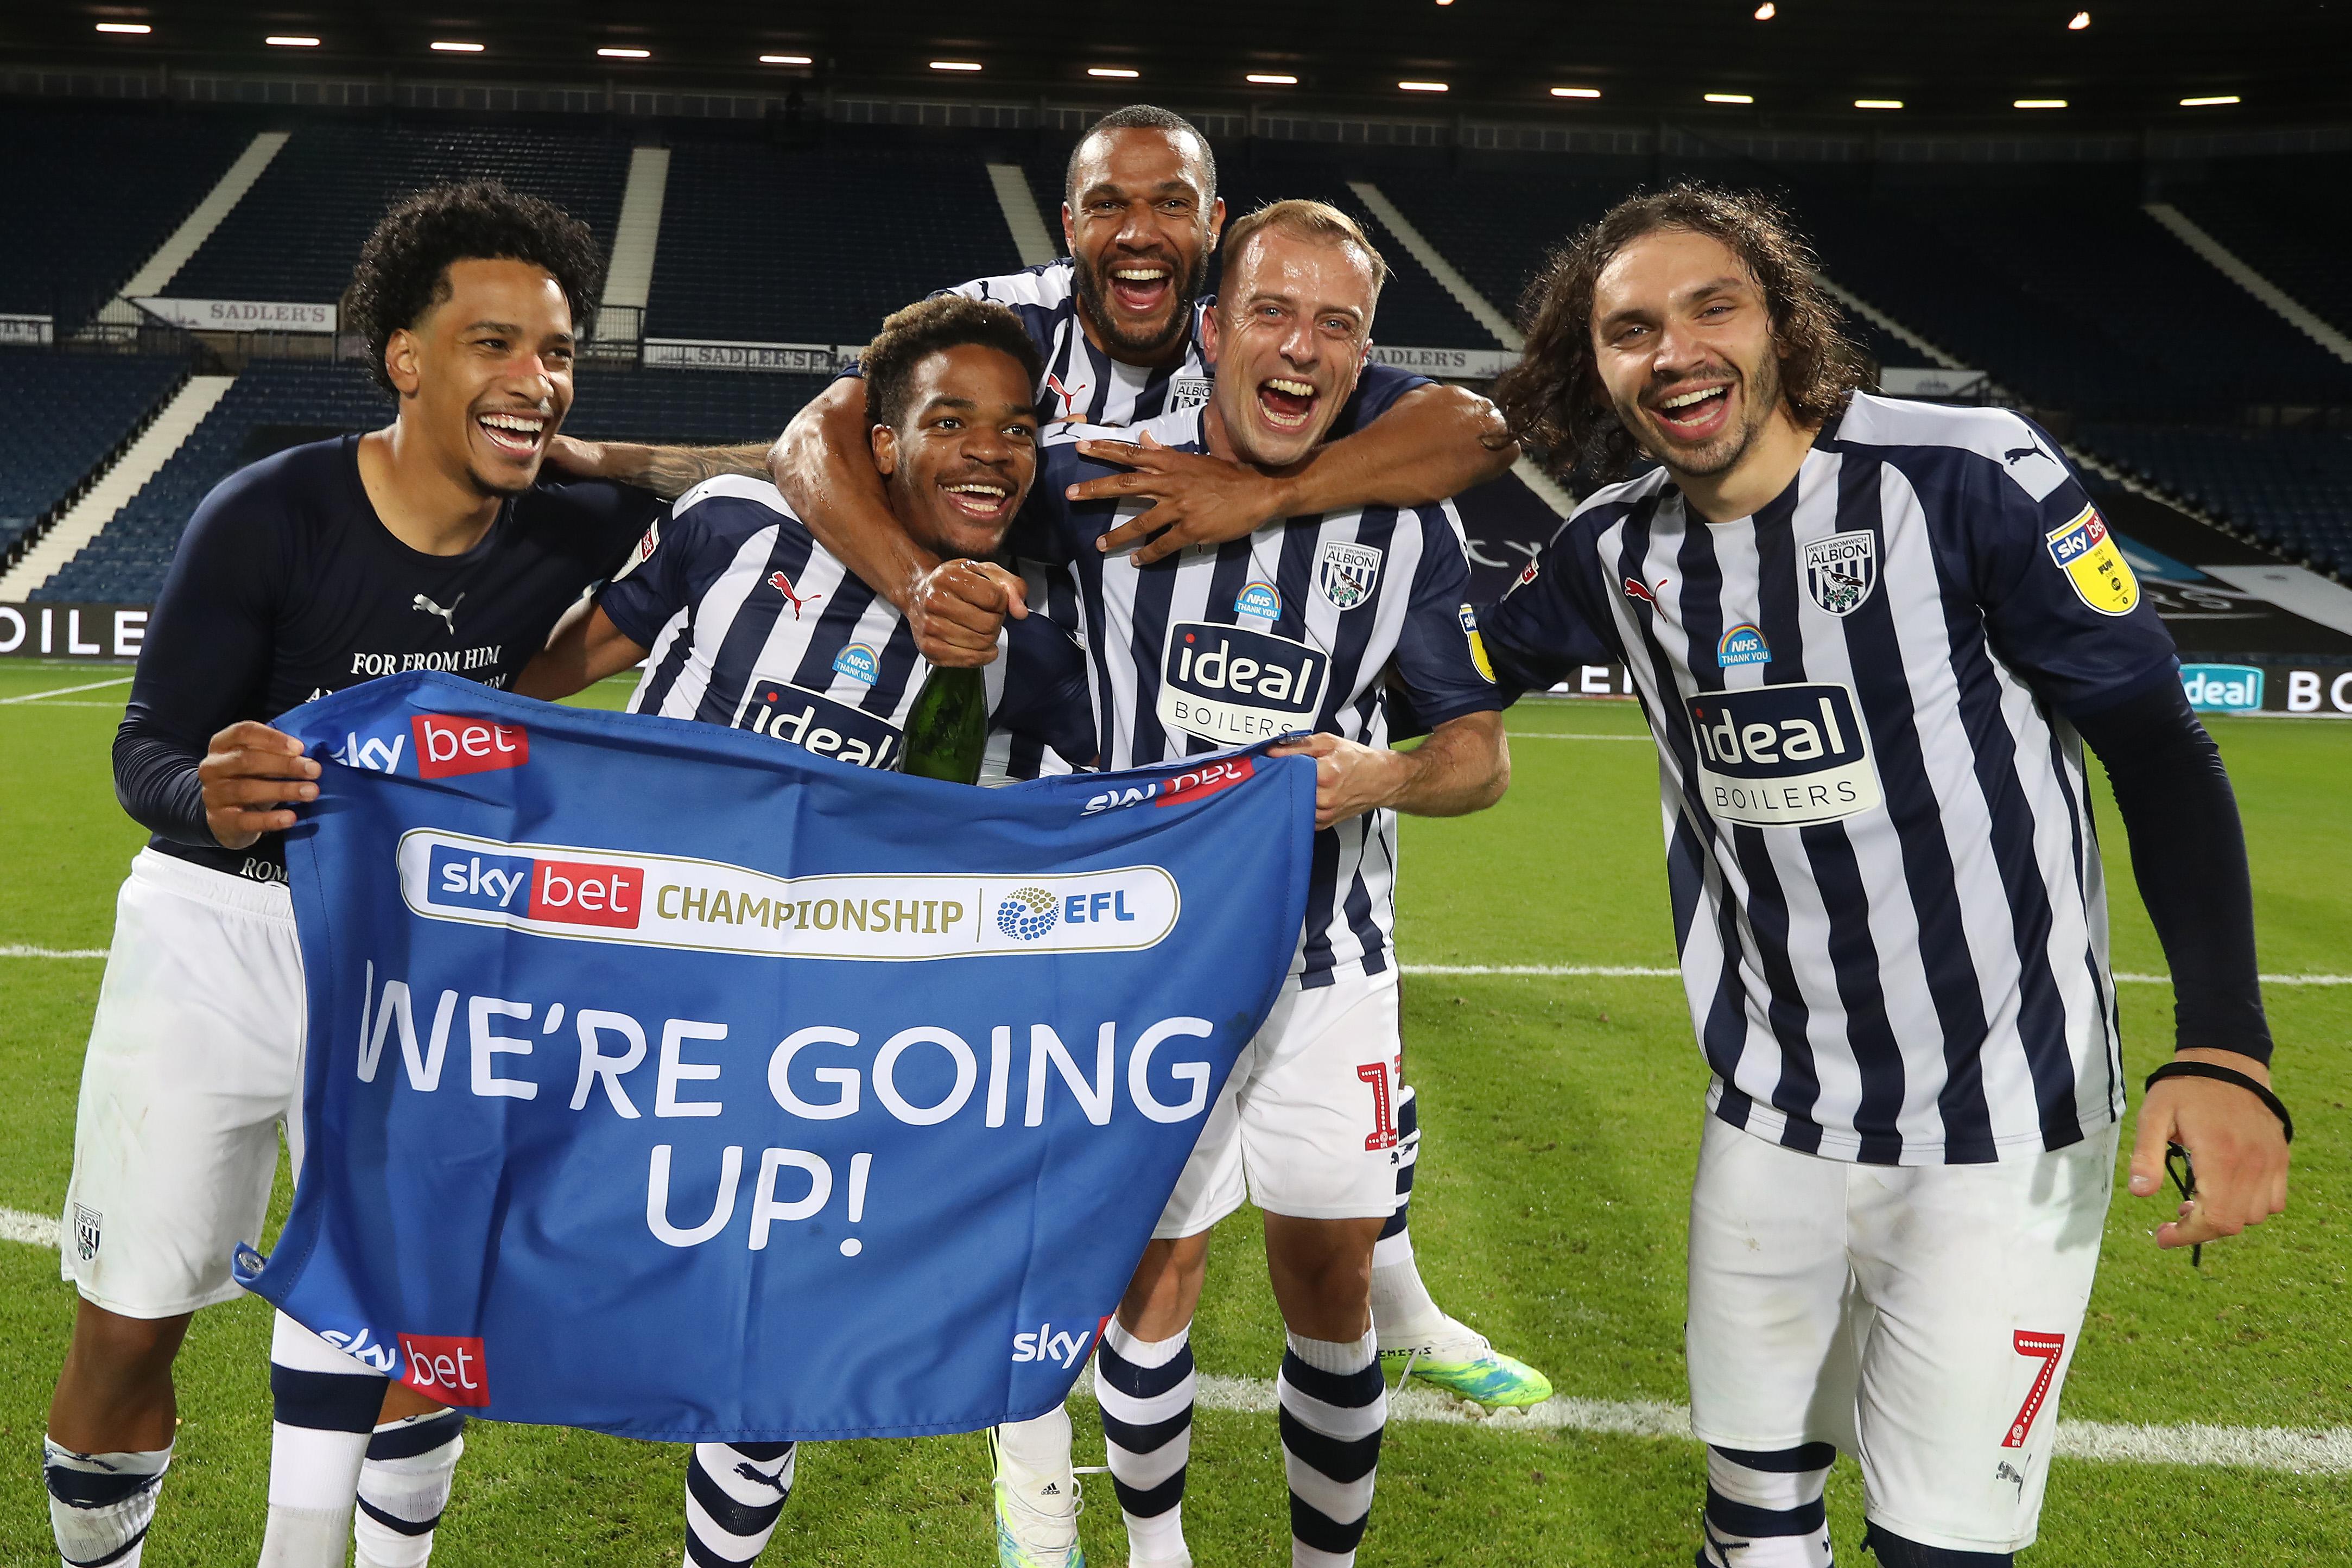 West Bromwich Albion v Queens Park Rangers - Sky Bet Championship